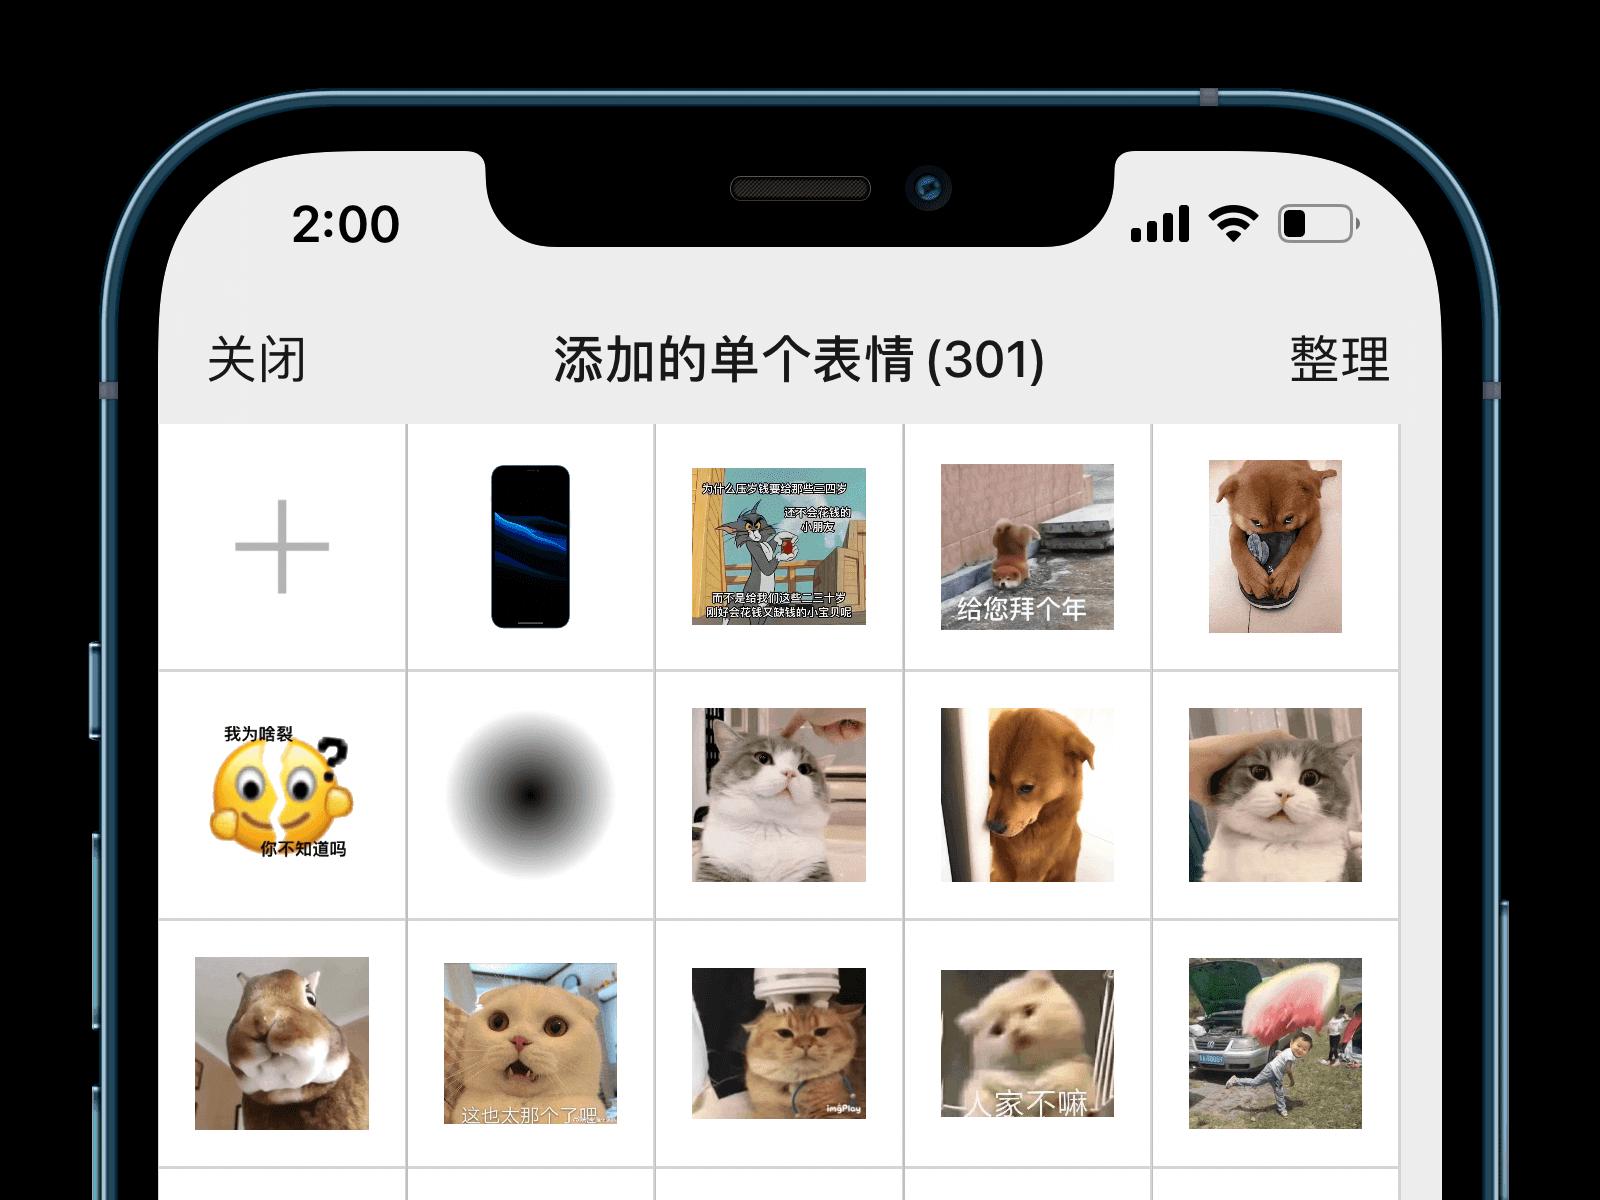 iOS微信8.0.3版本更新,表情上限调整、朋友圈30秒视频